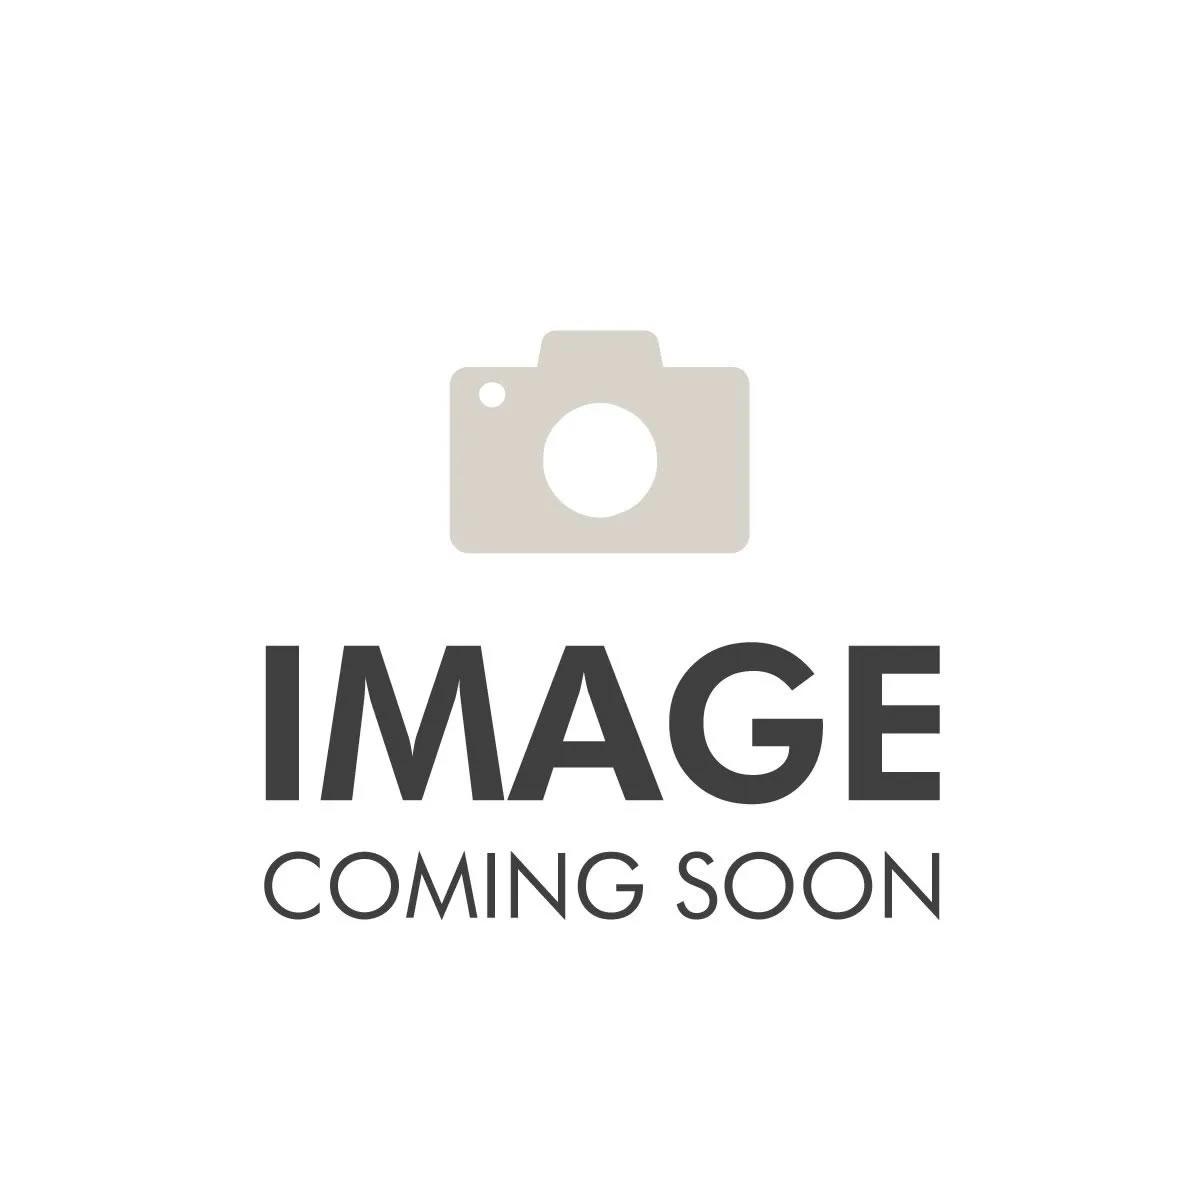 Door Mirror Kit, LED Signal, Dual Focus, Chrome; 87-02 Jeep Wrangler